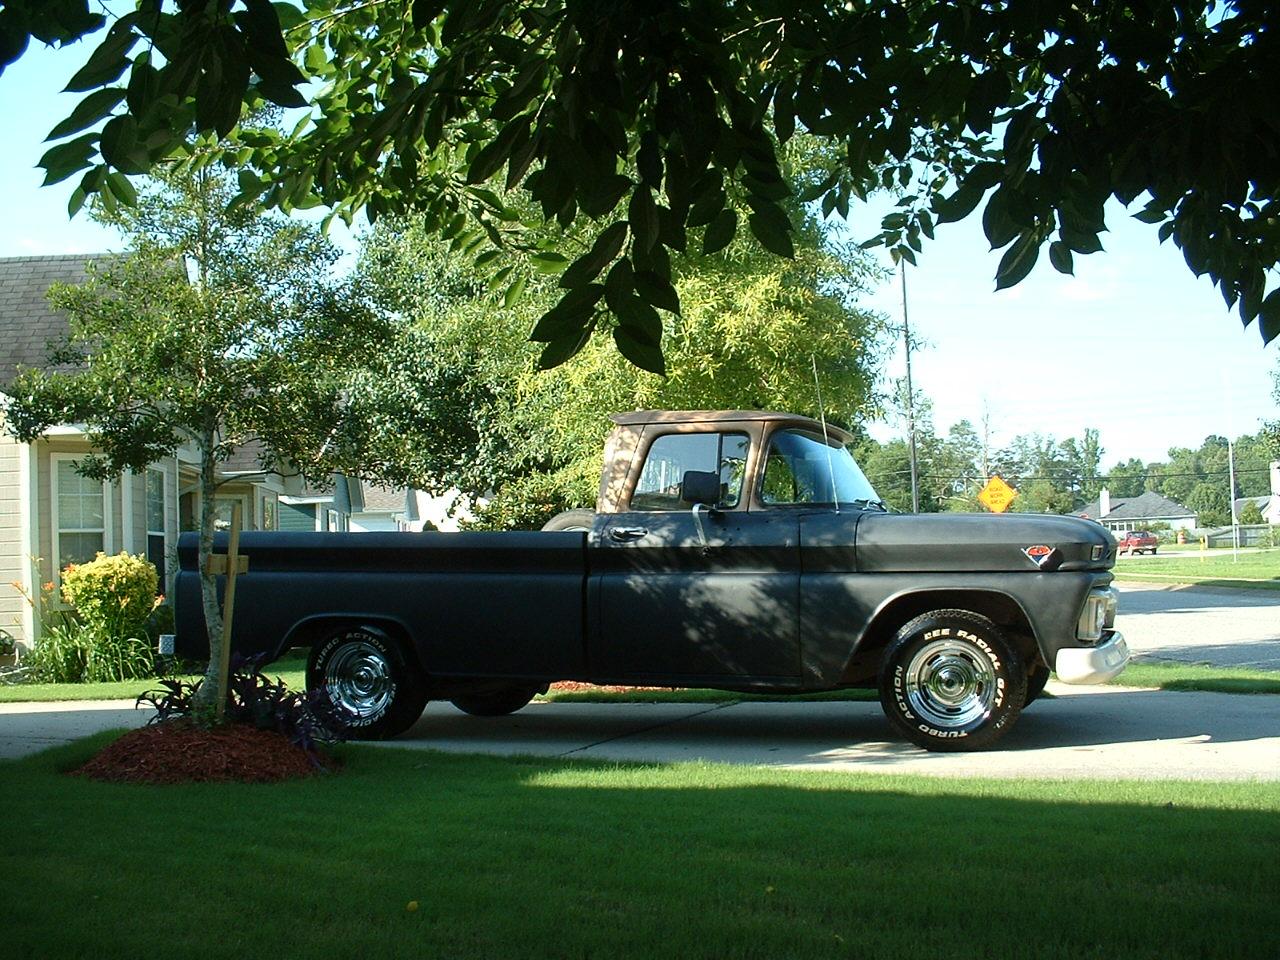 1962 gmctruck for sale sale gmc classic trucks gmc trucks for sale gmc